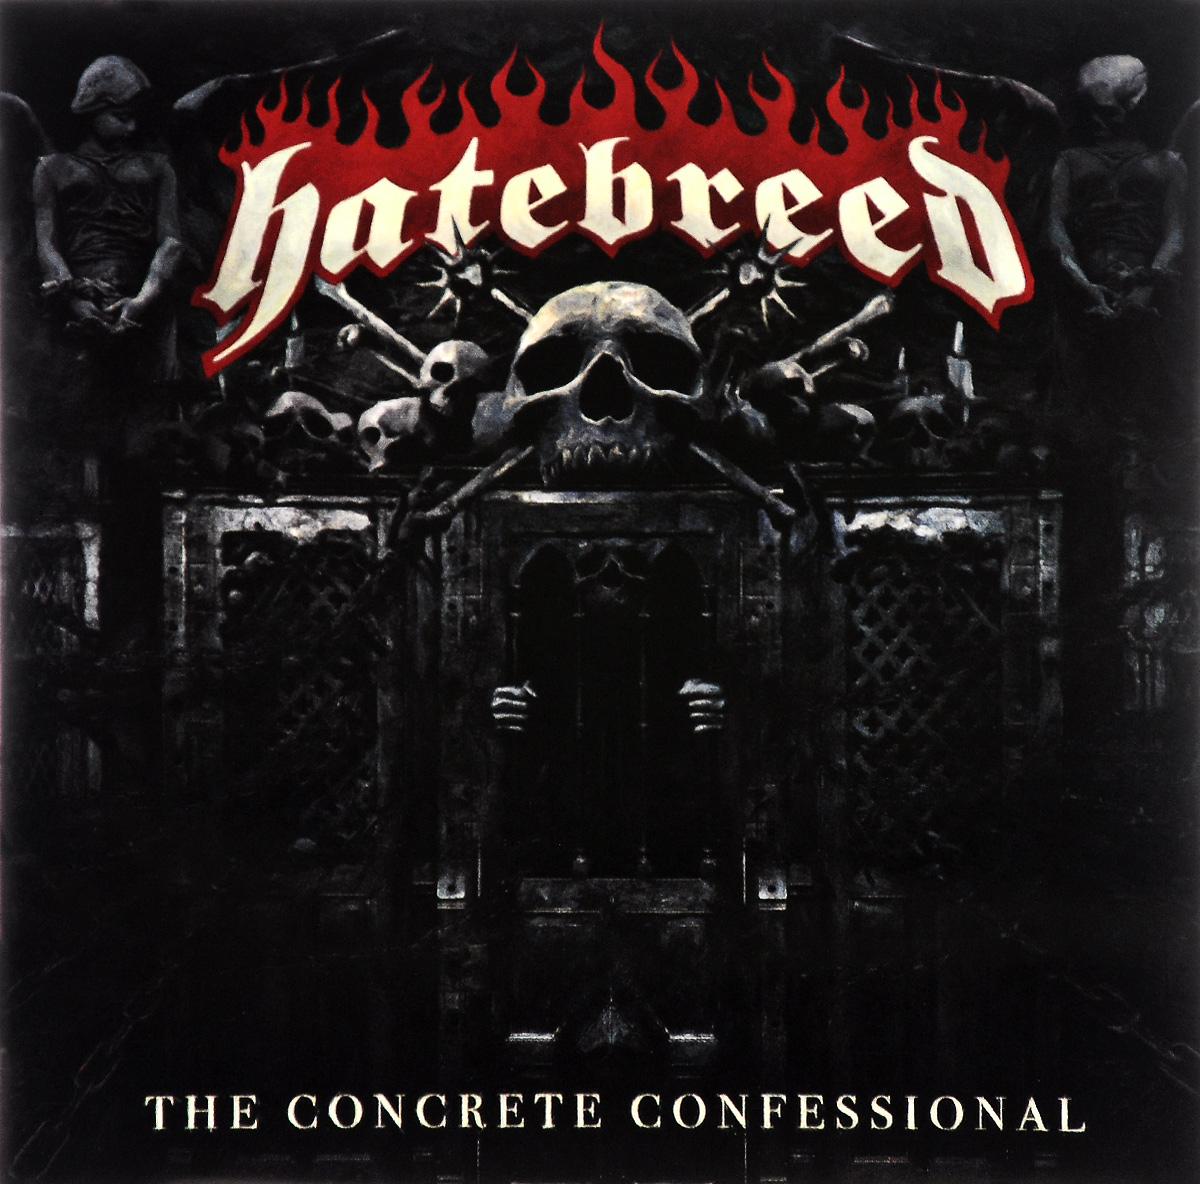 Hatebreed. The Concrete Confessional